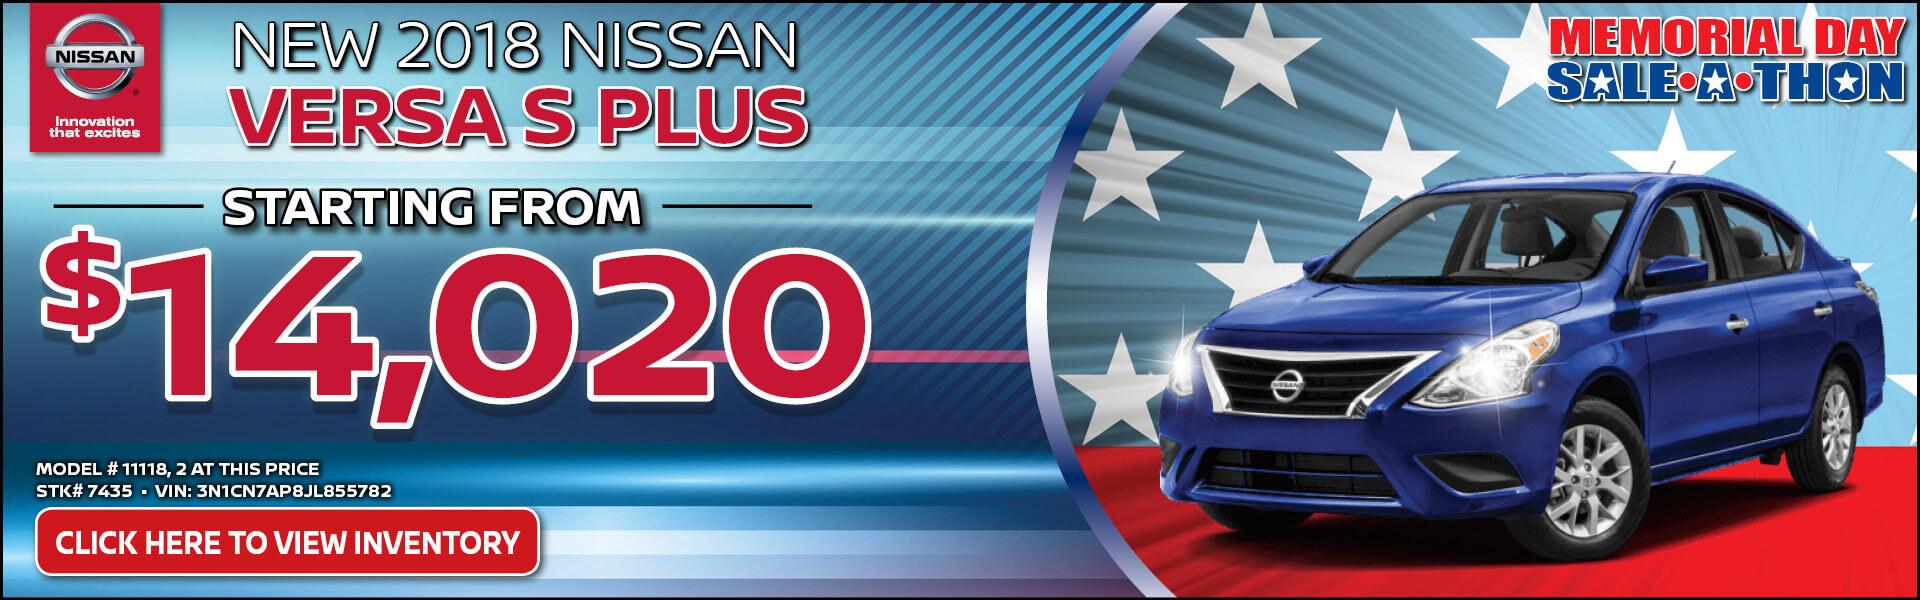 Nissan Versa Versa S Plus $14,020 Purchase